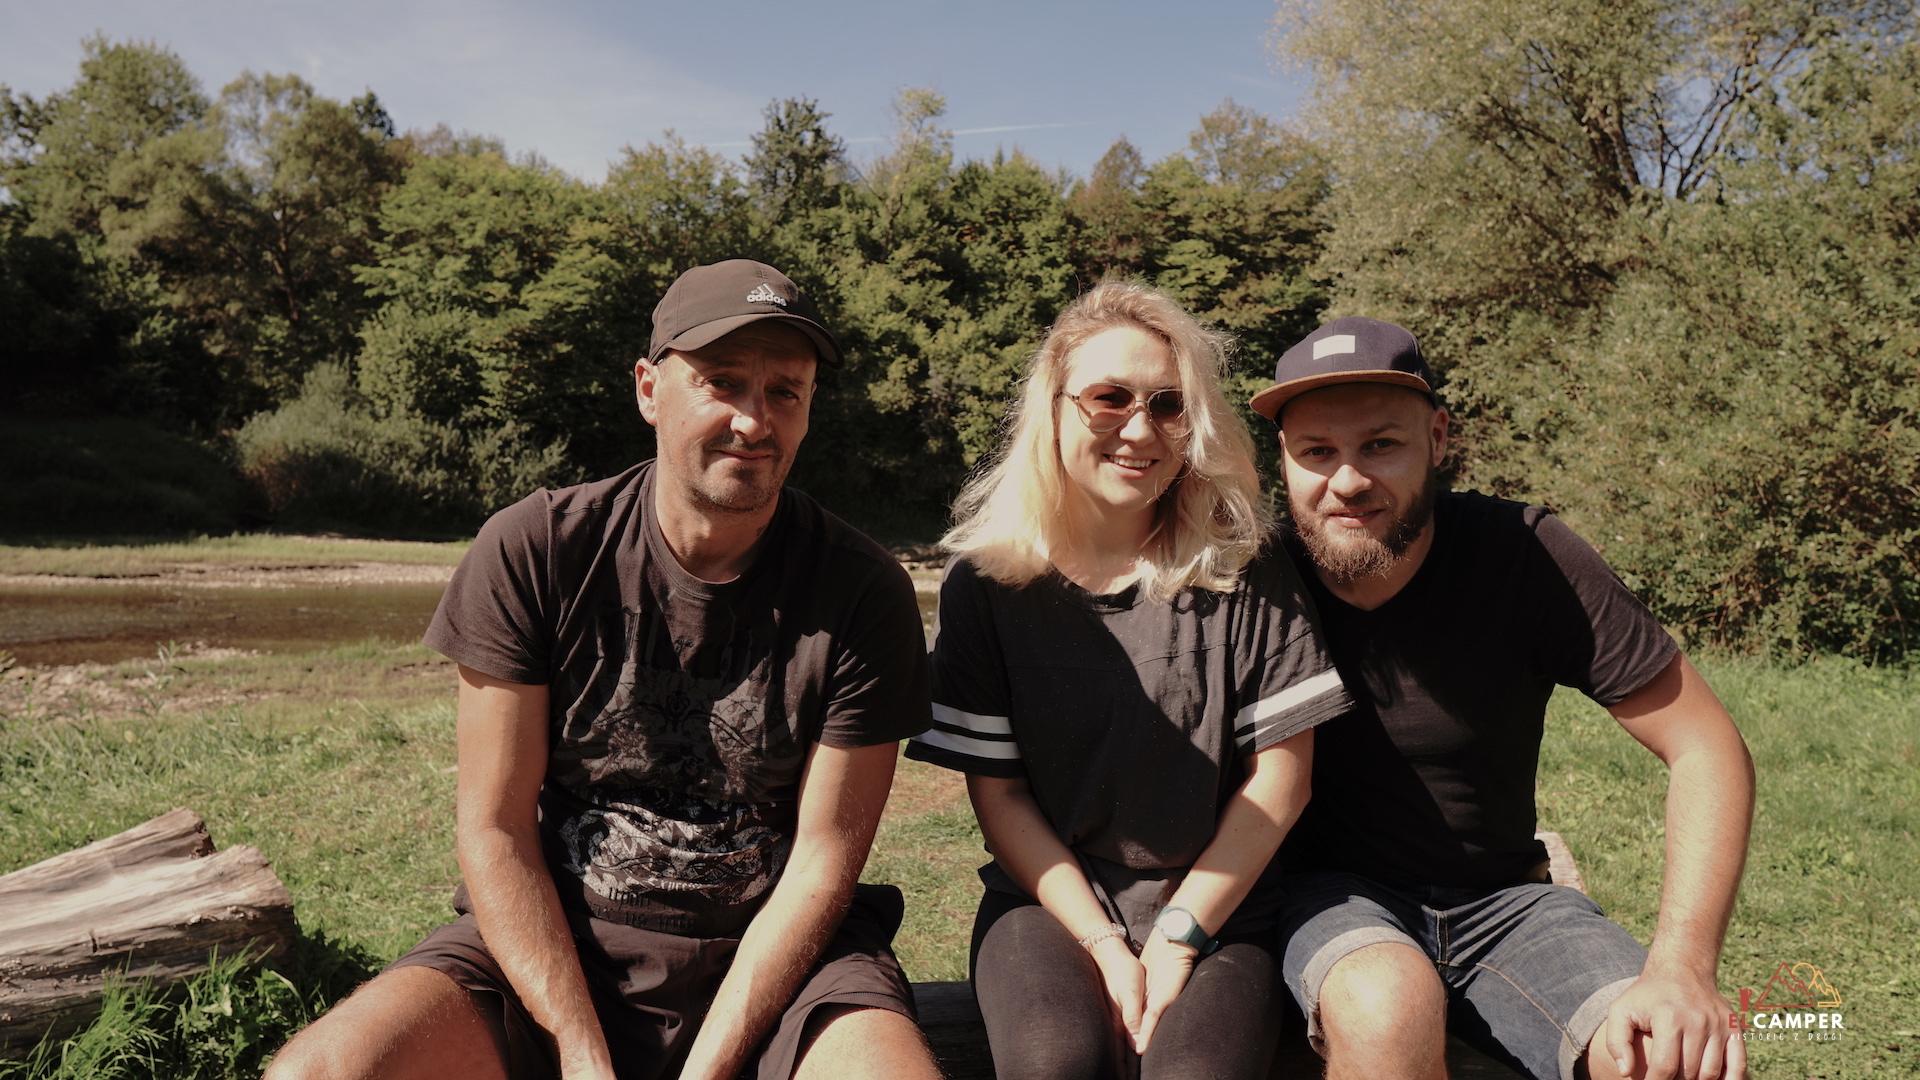 Romet ogar 200 w trasie campervan life polska elcamper boxtruck van